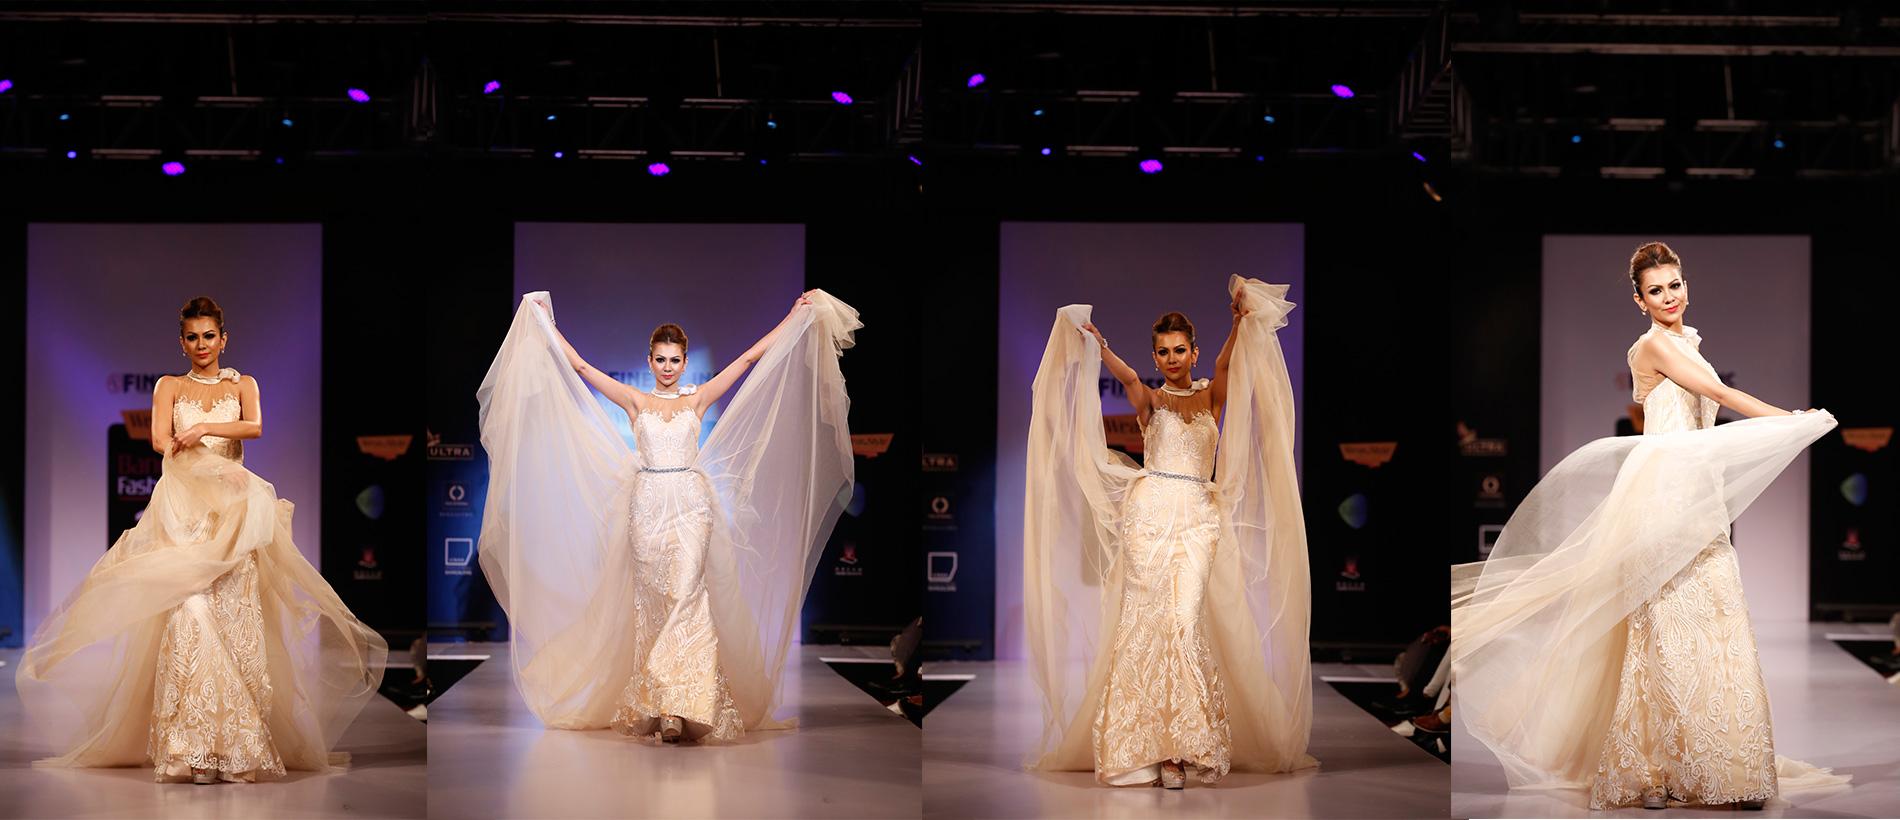 The Bride's Wedding Veil